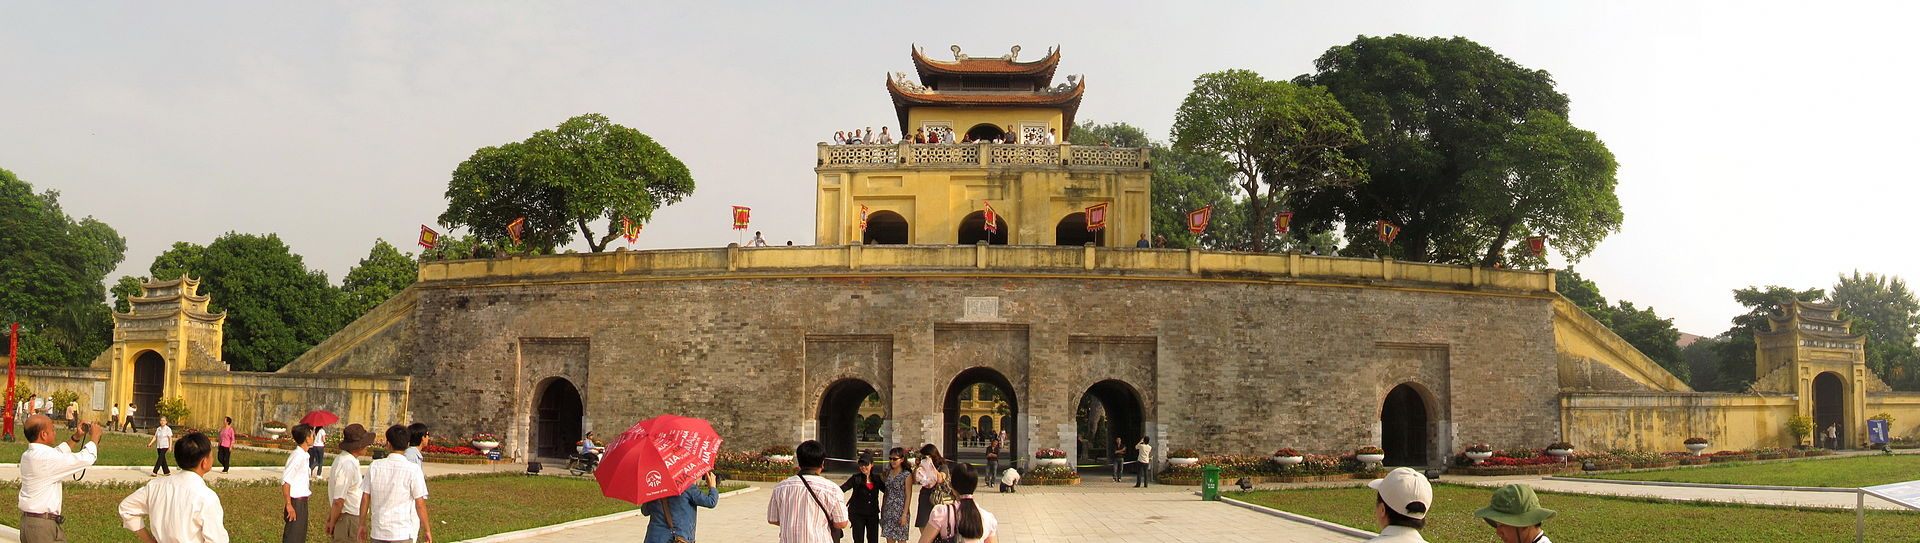 Main Gate - Citadel of Hanoi.jpg